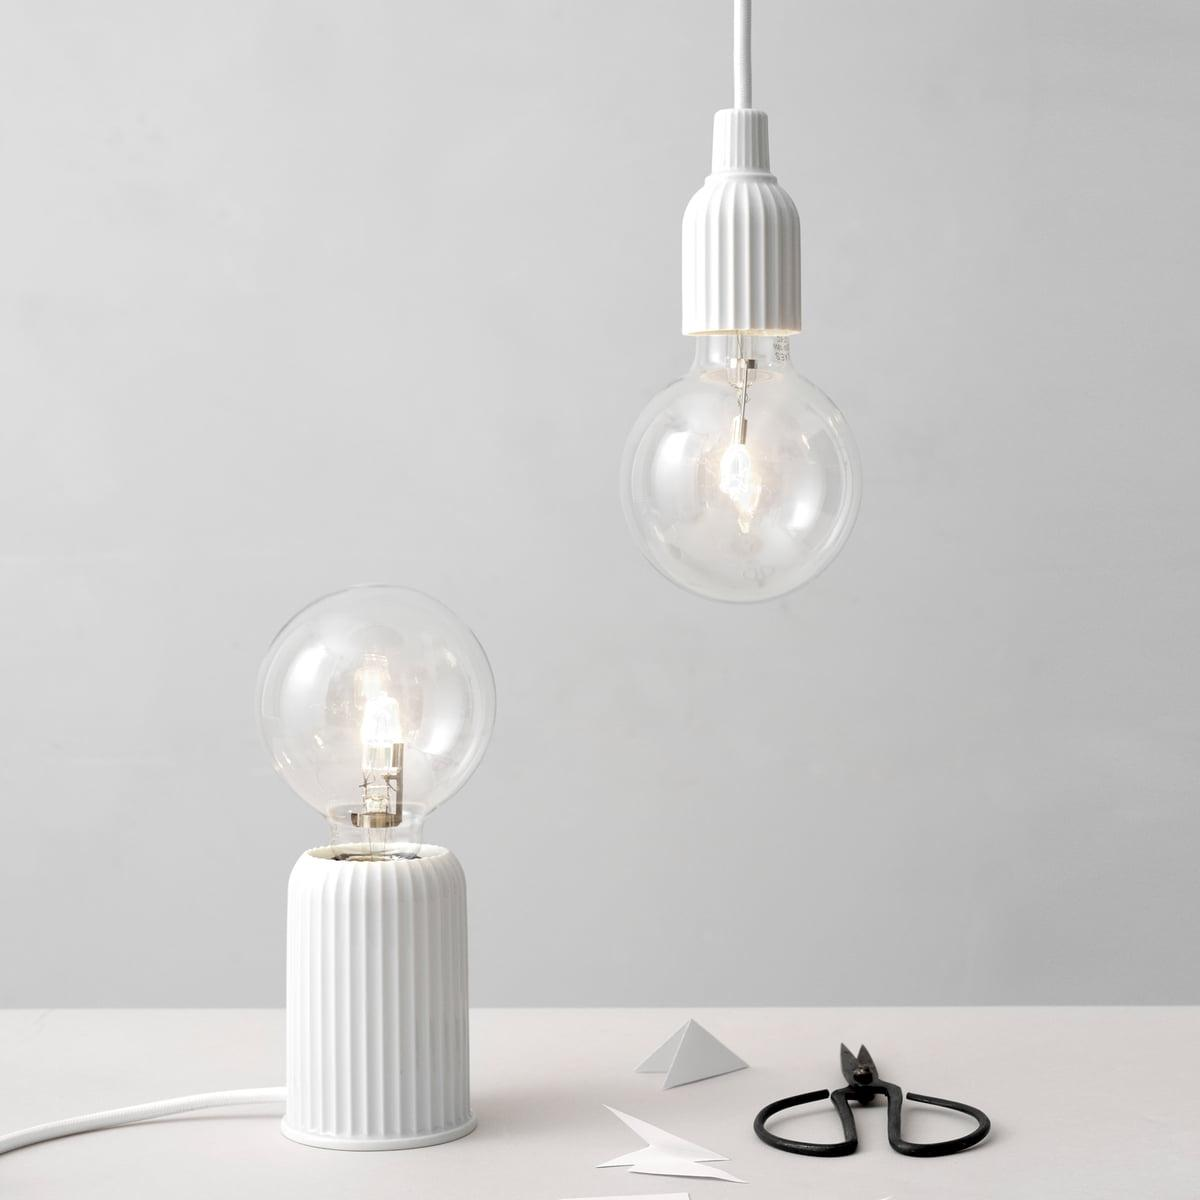 Lampe Weiße Kugel